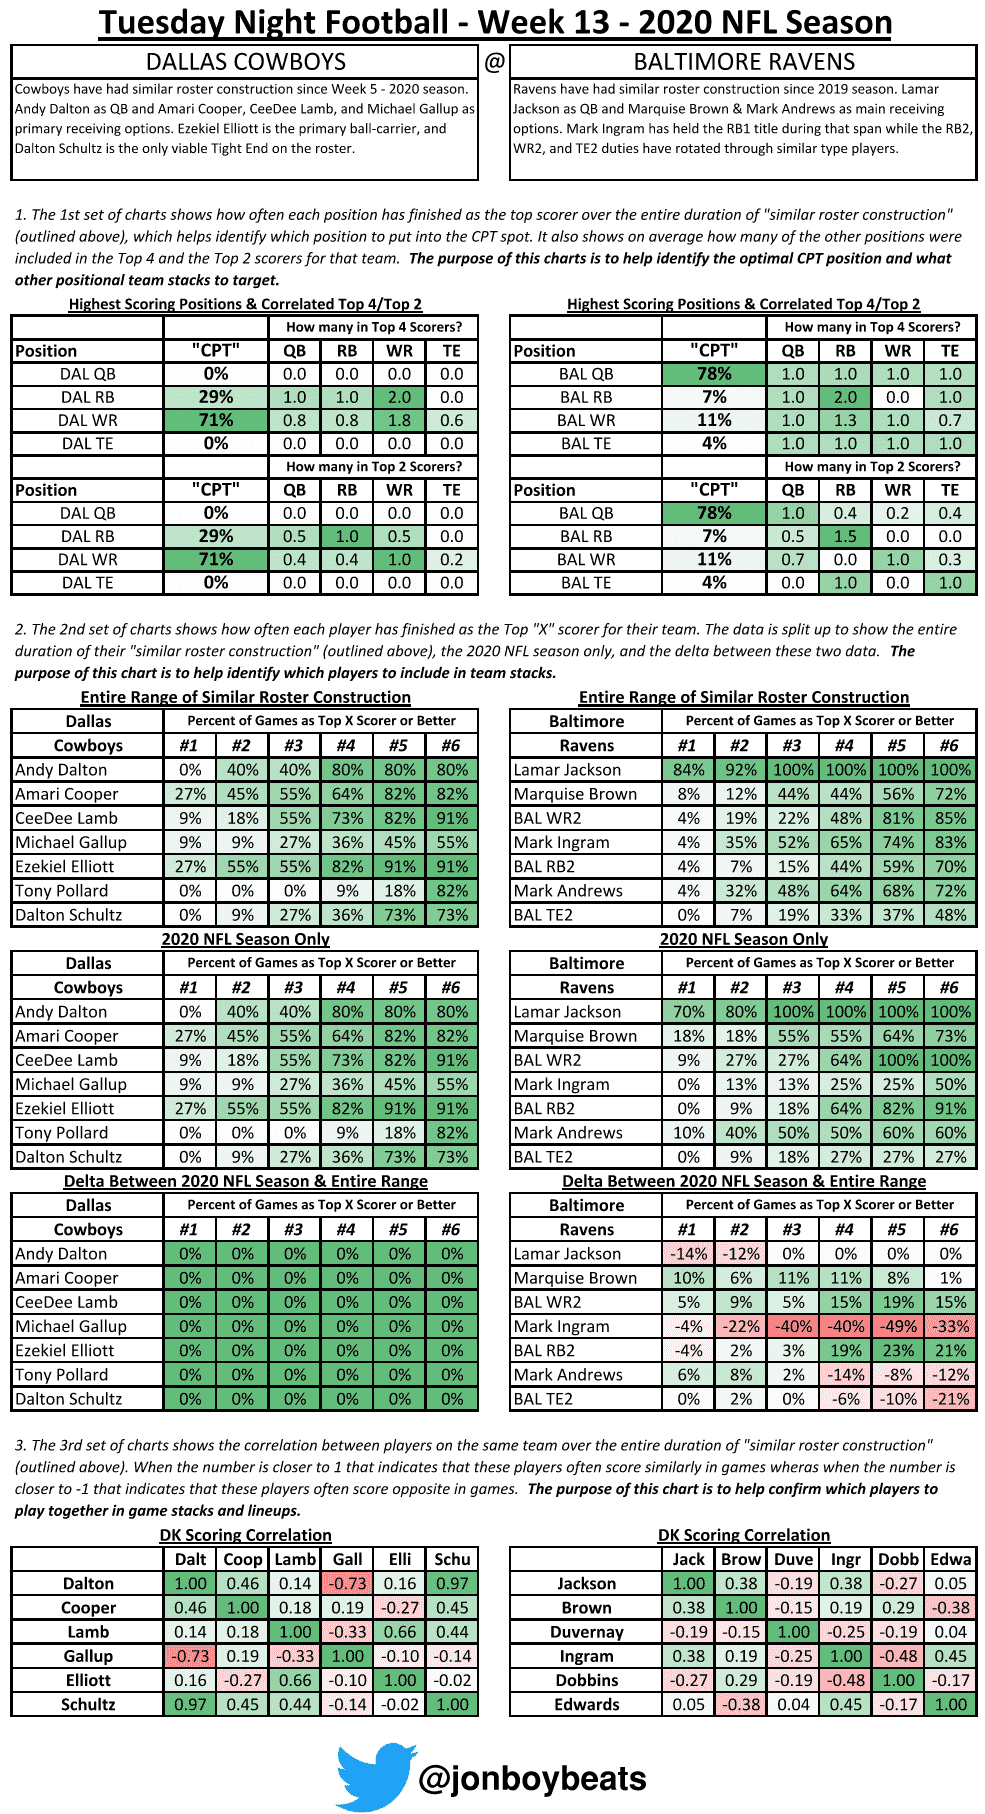 DraftKings Showdown Picks Worksheet: Cowboys at Ravens